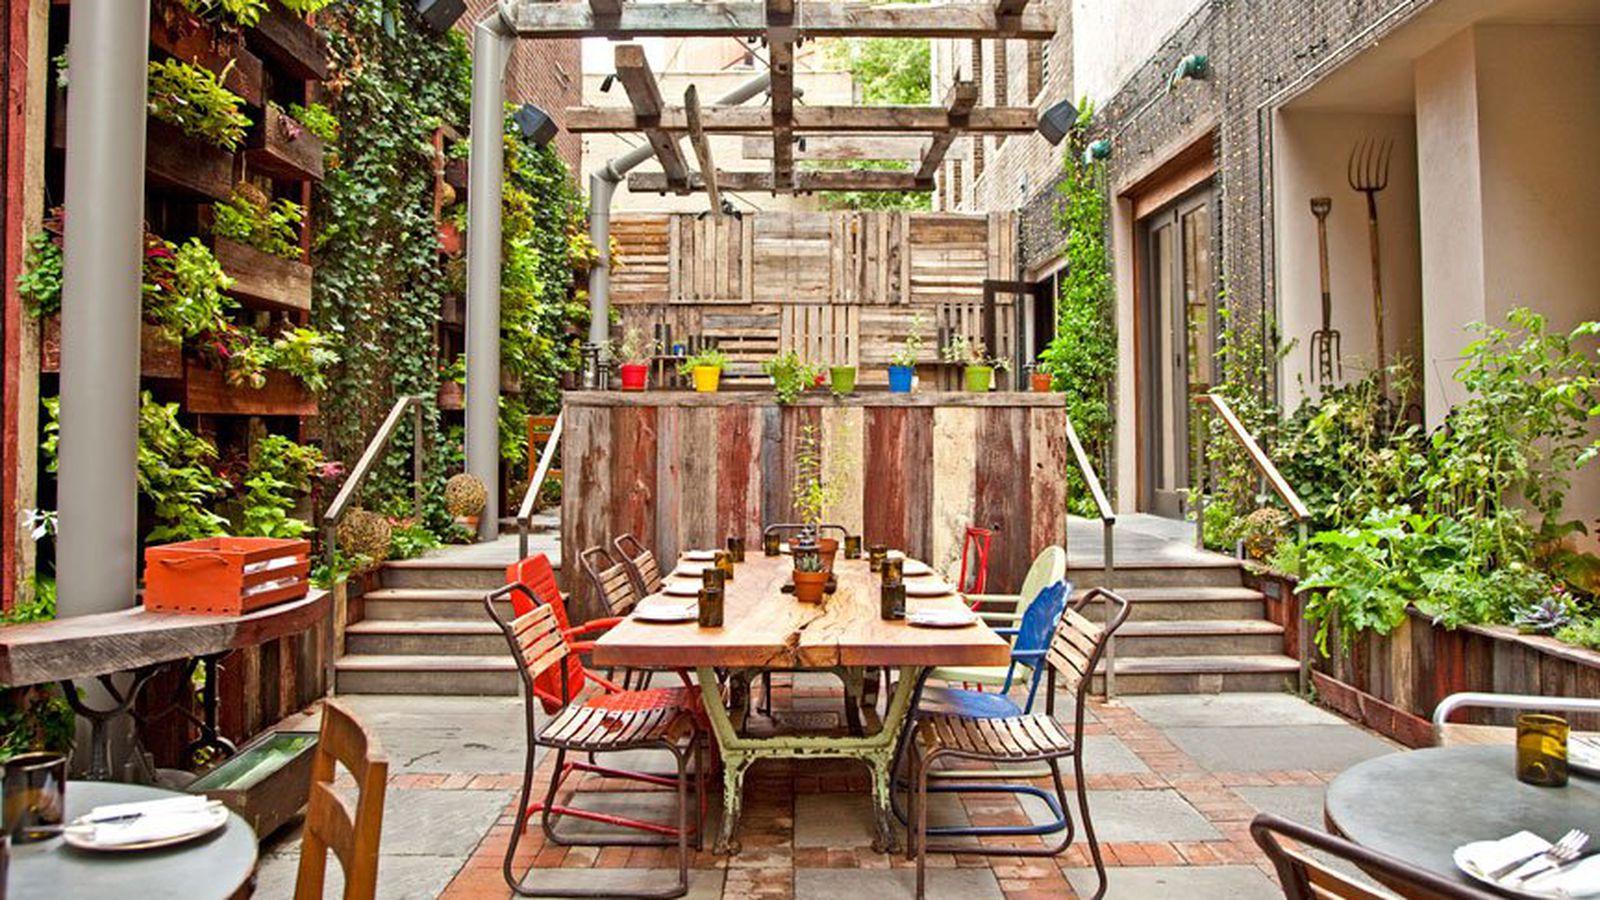 14 Essential Outdoor Dining Spots in Philadelphia